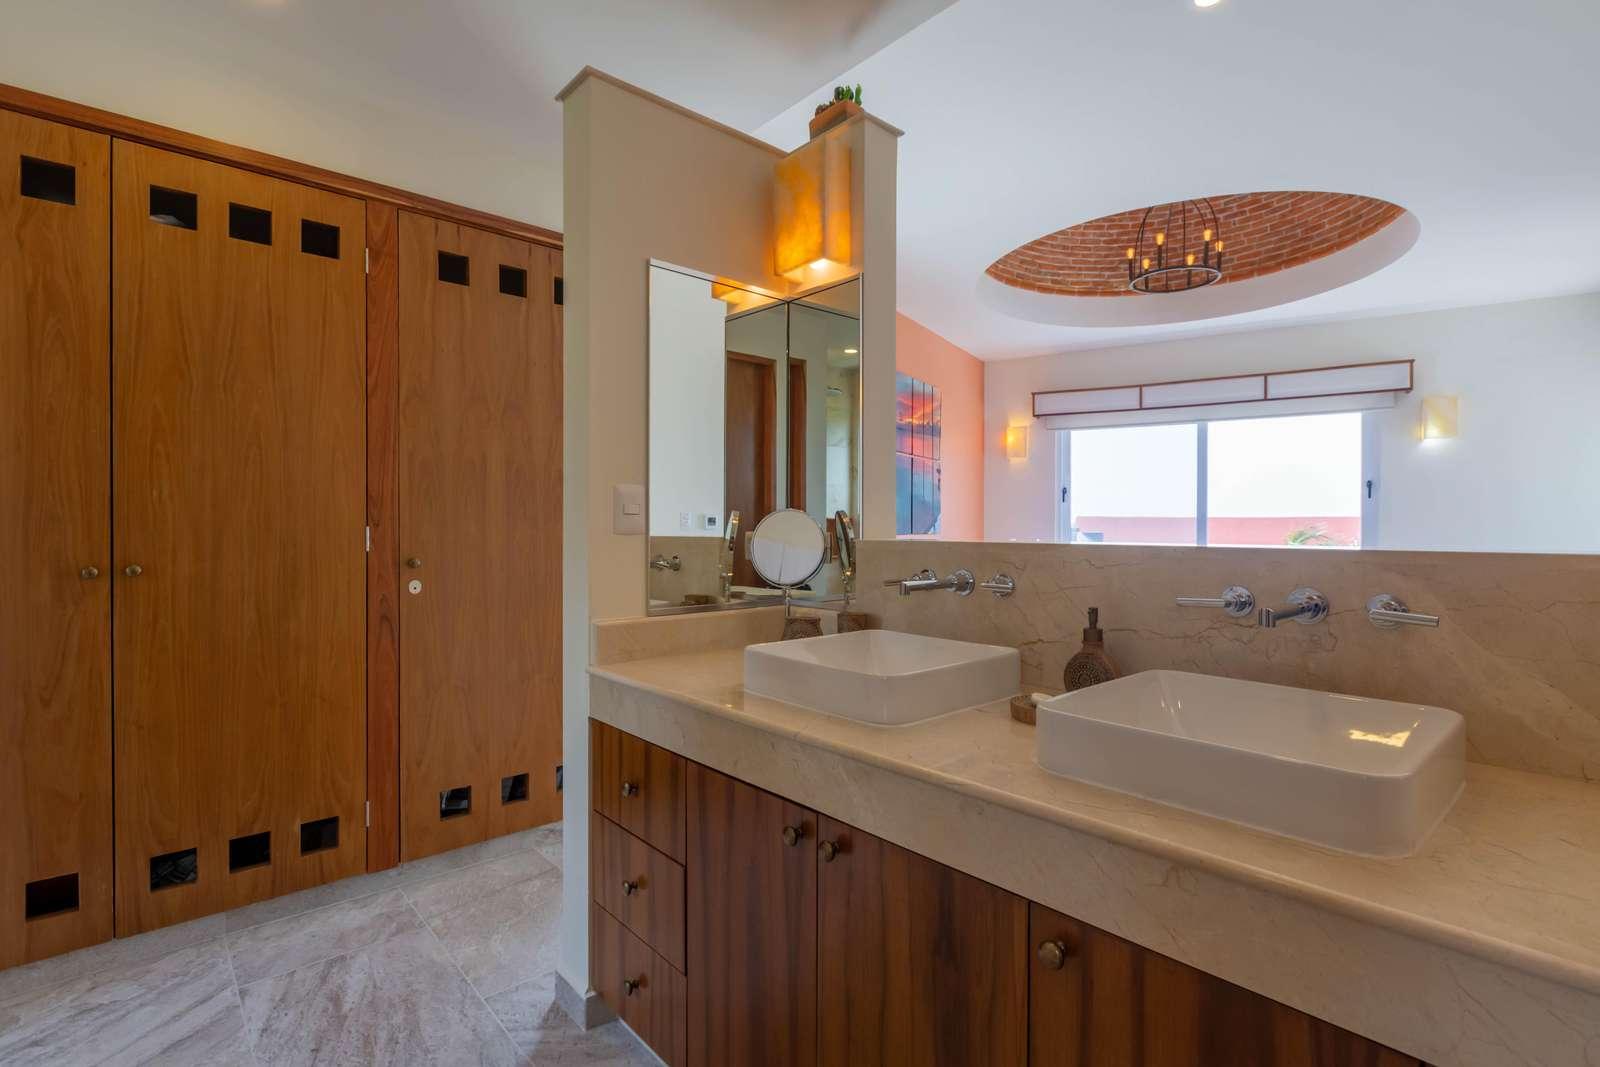 Master Bathroom His/Her Vanity